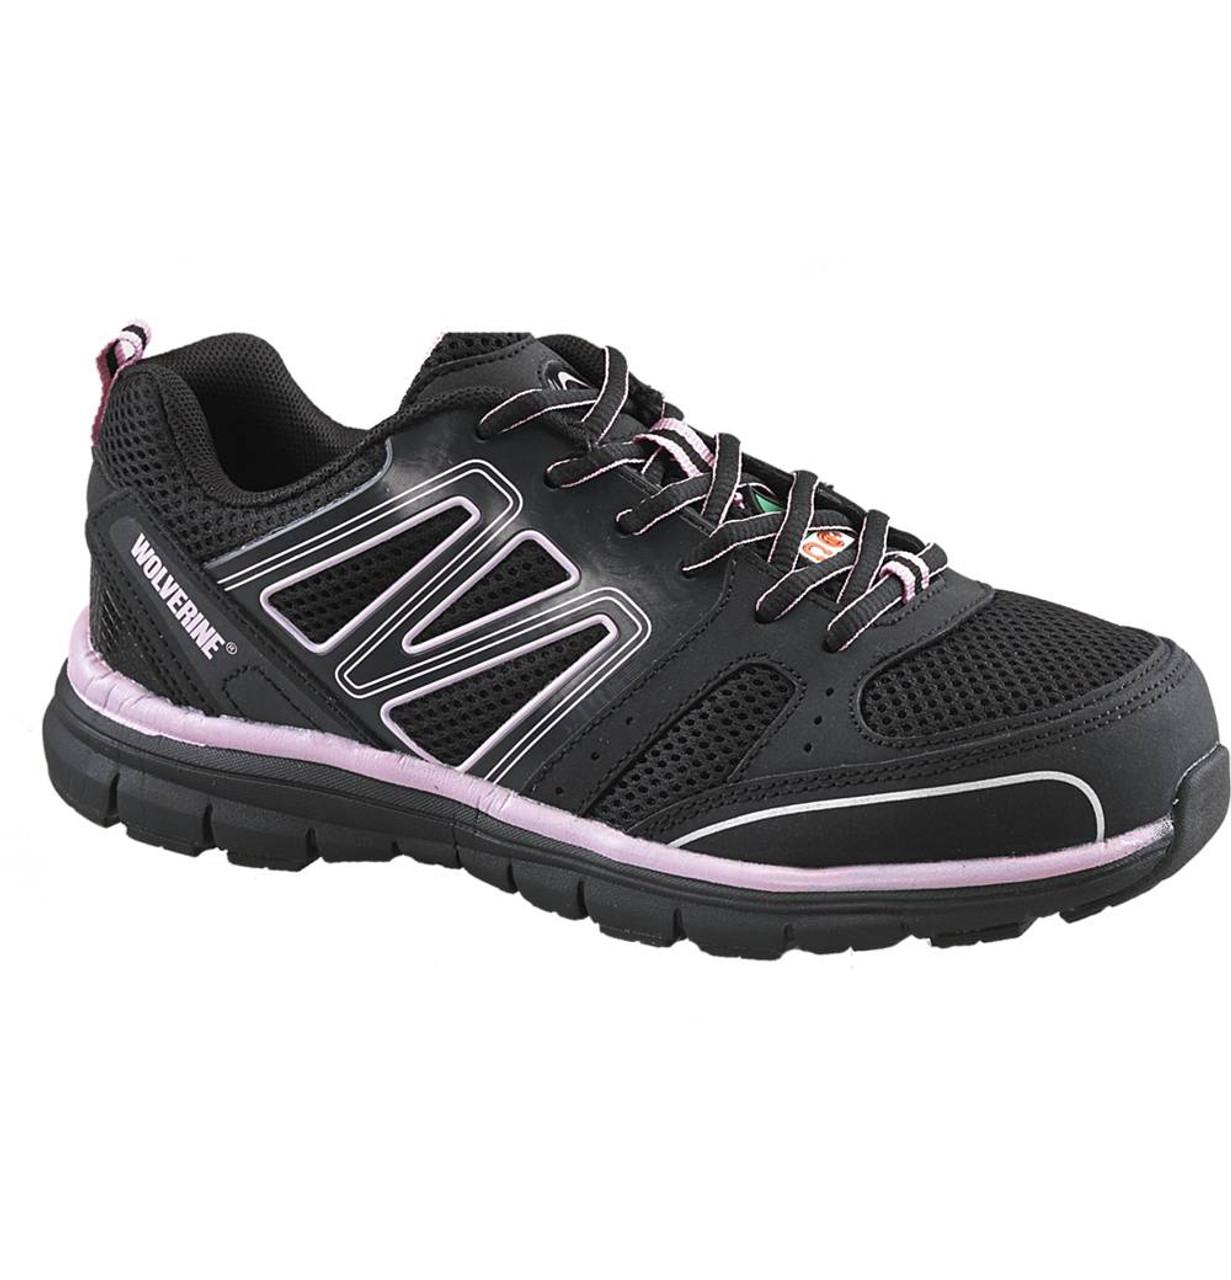 951cf71b653 Women's Wolverine Nimble CSA Safety Shoe